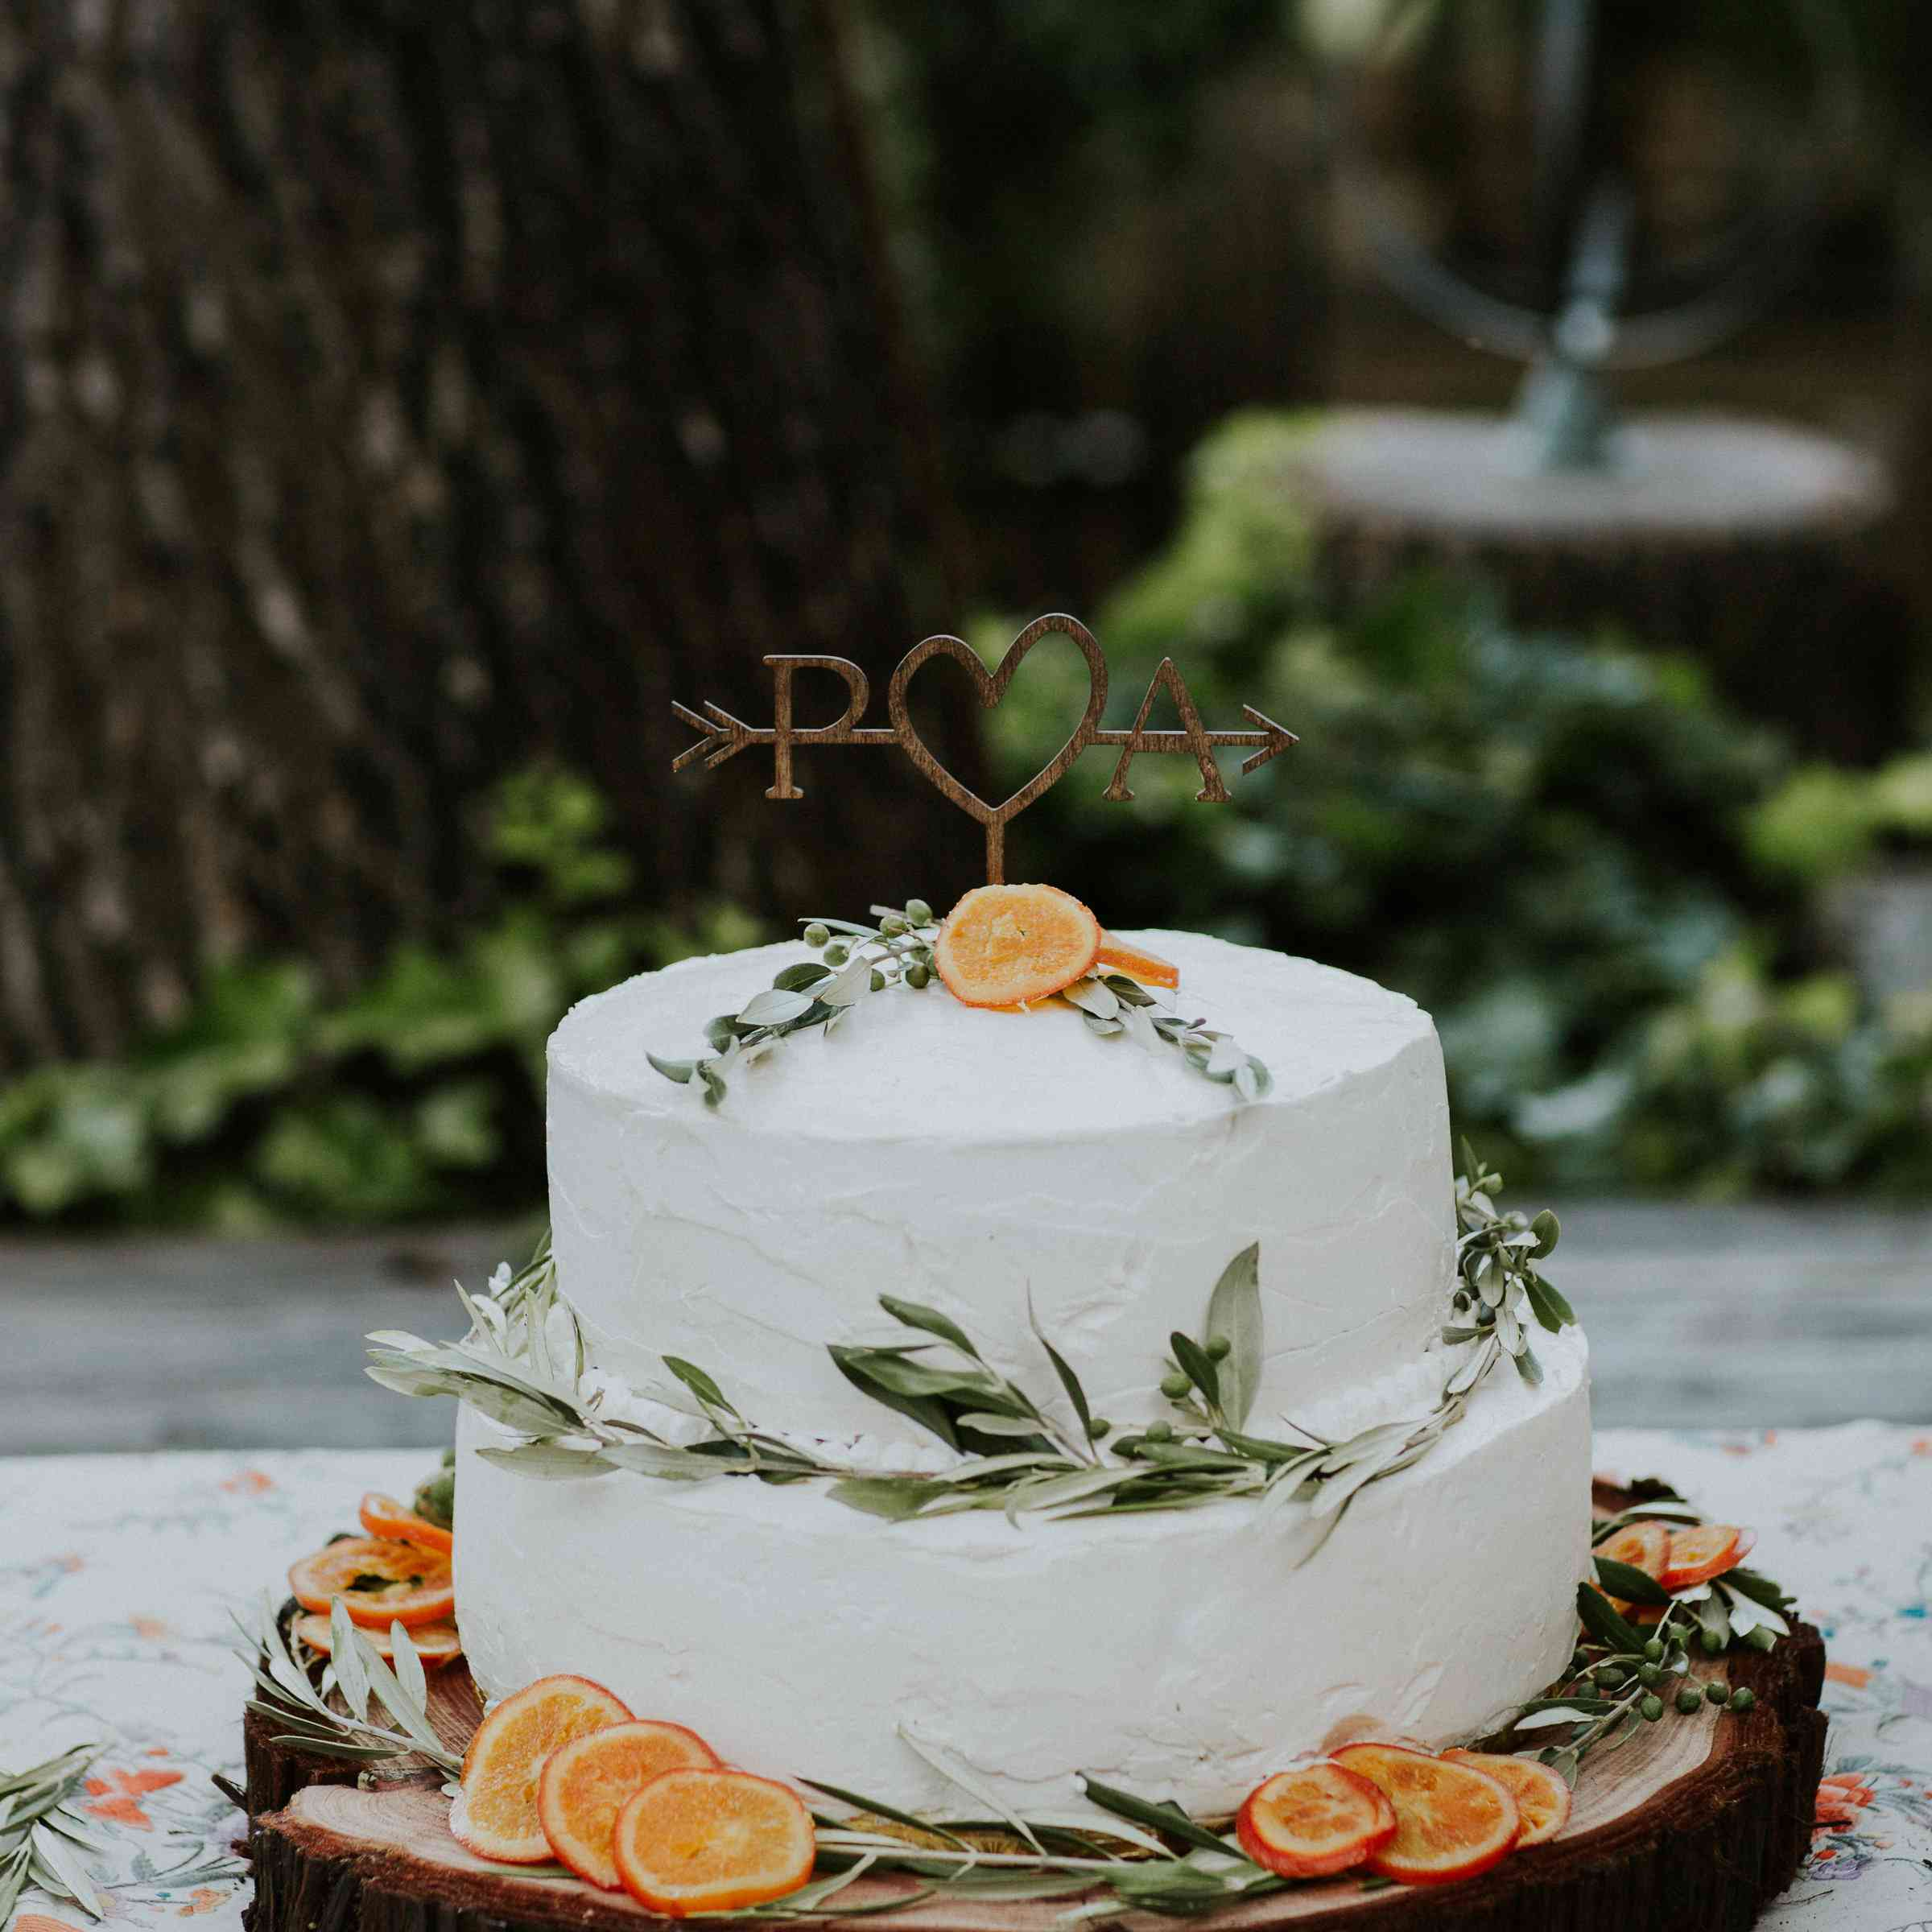 A white wedding cake with orange slices